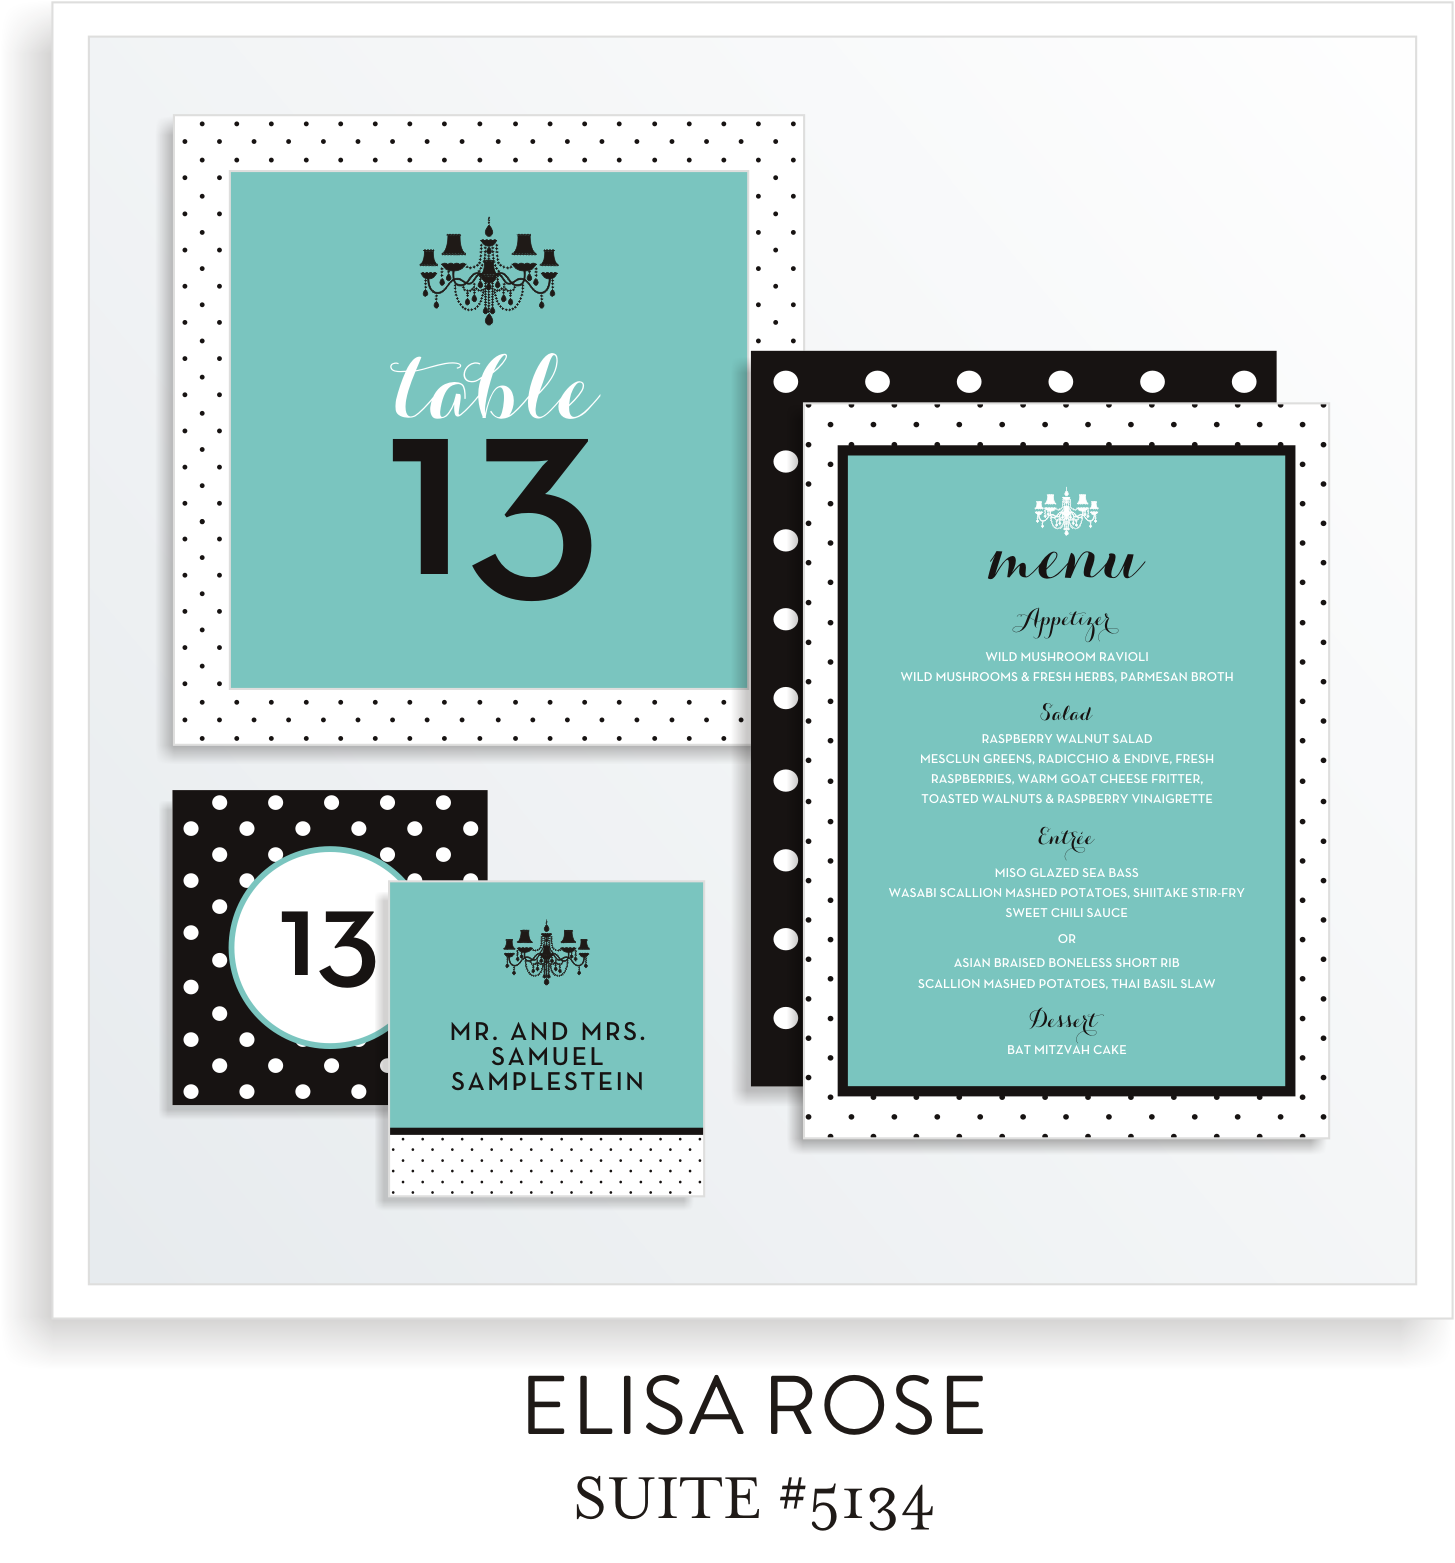 Table Top Decor Bat Mitzvah Suite 5134 - Elisa Rose